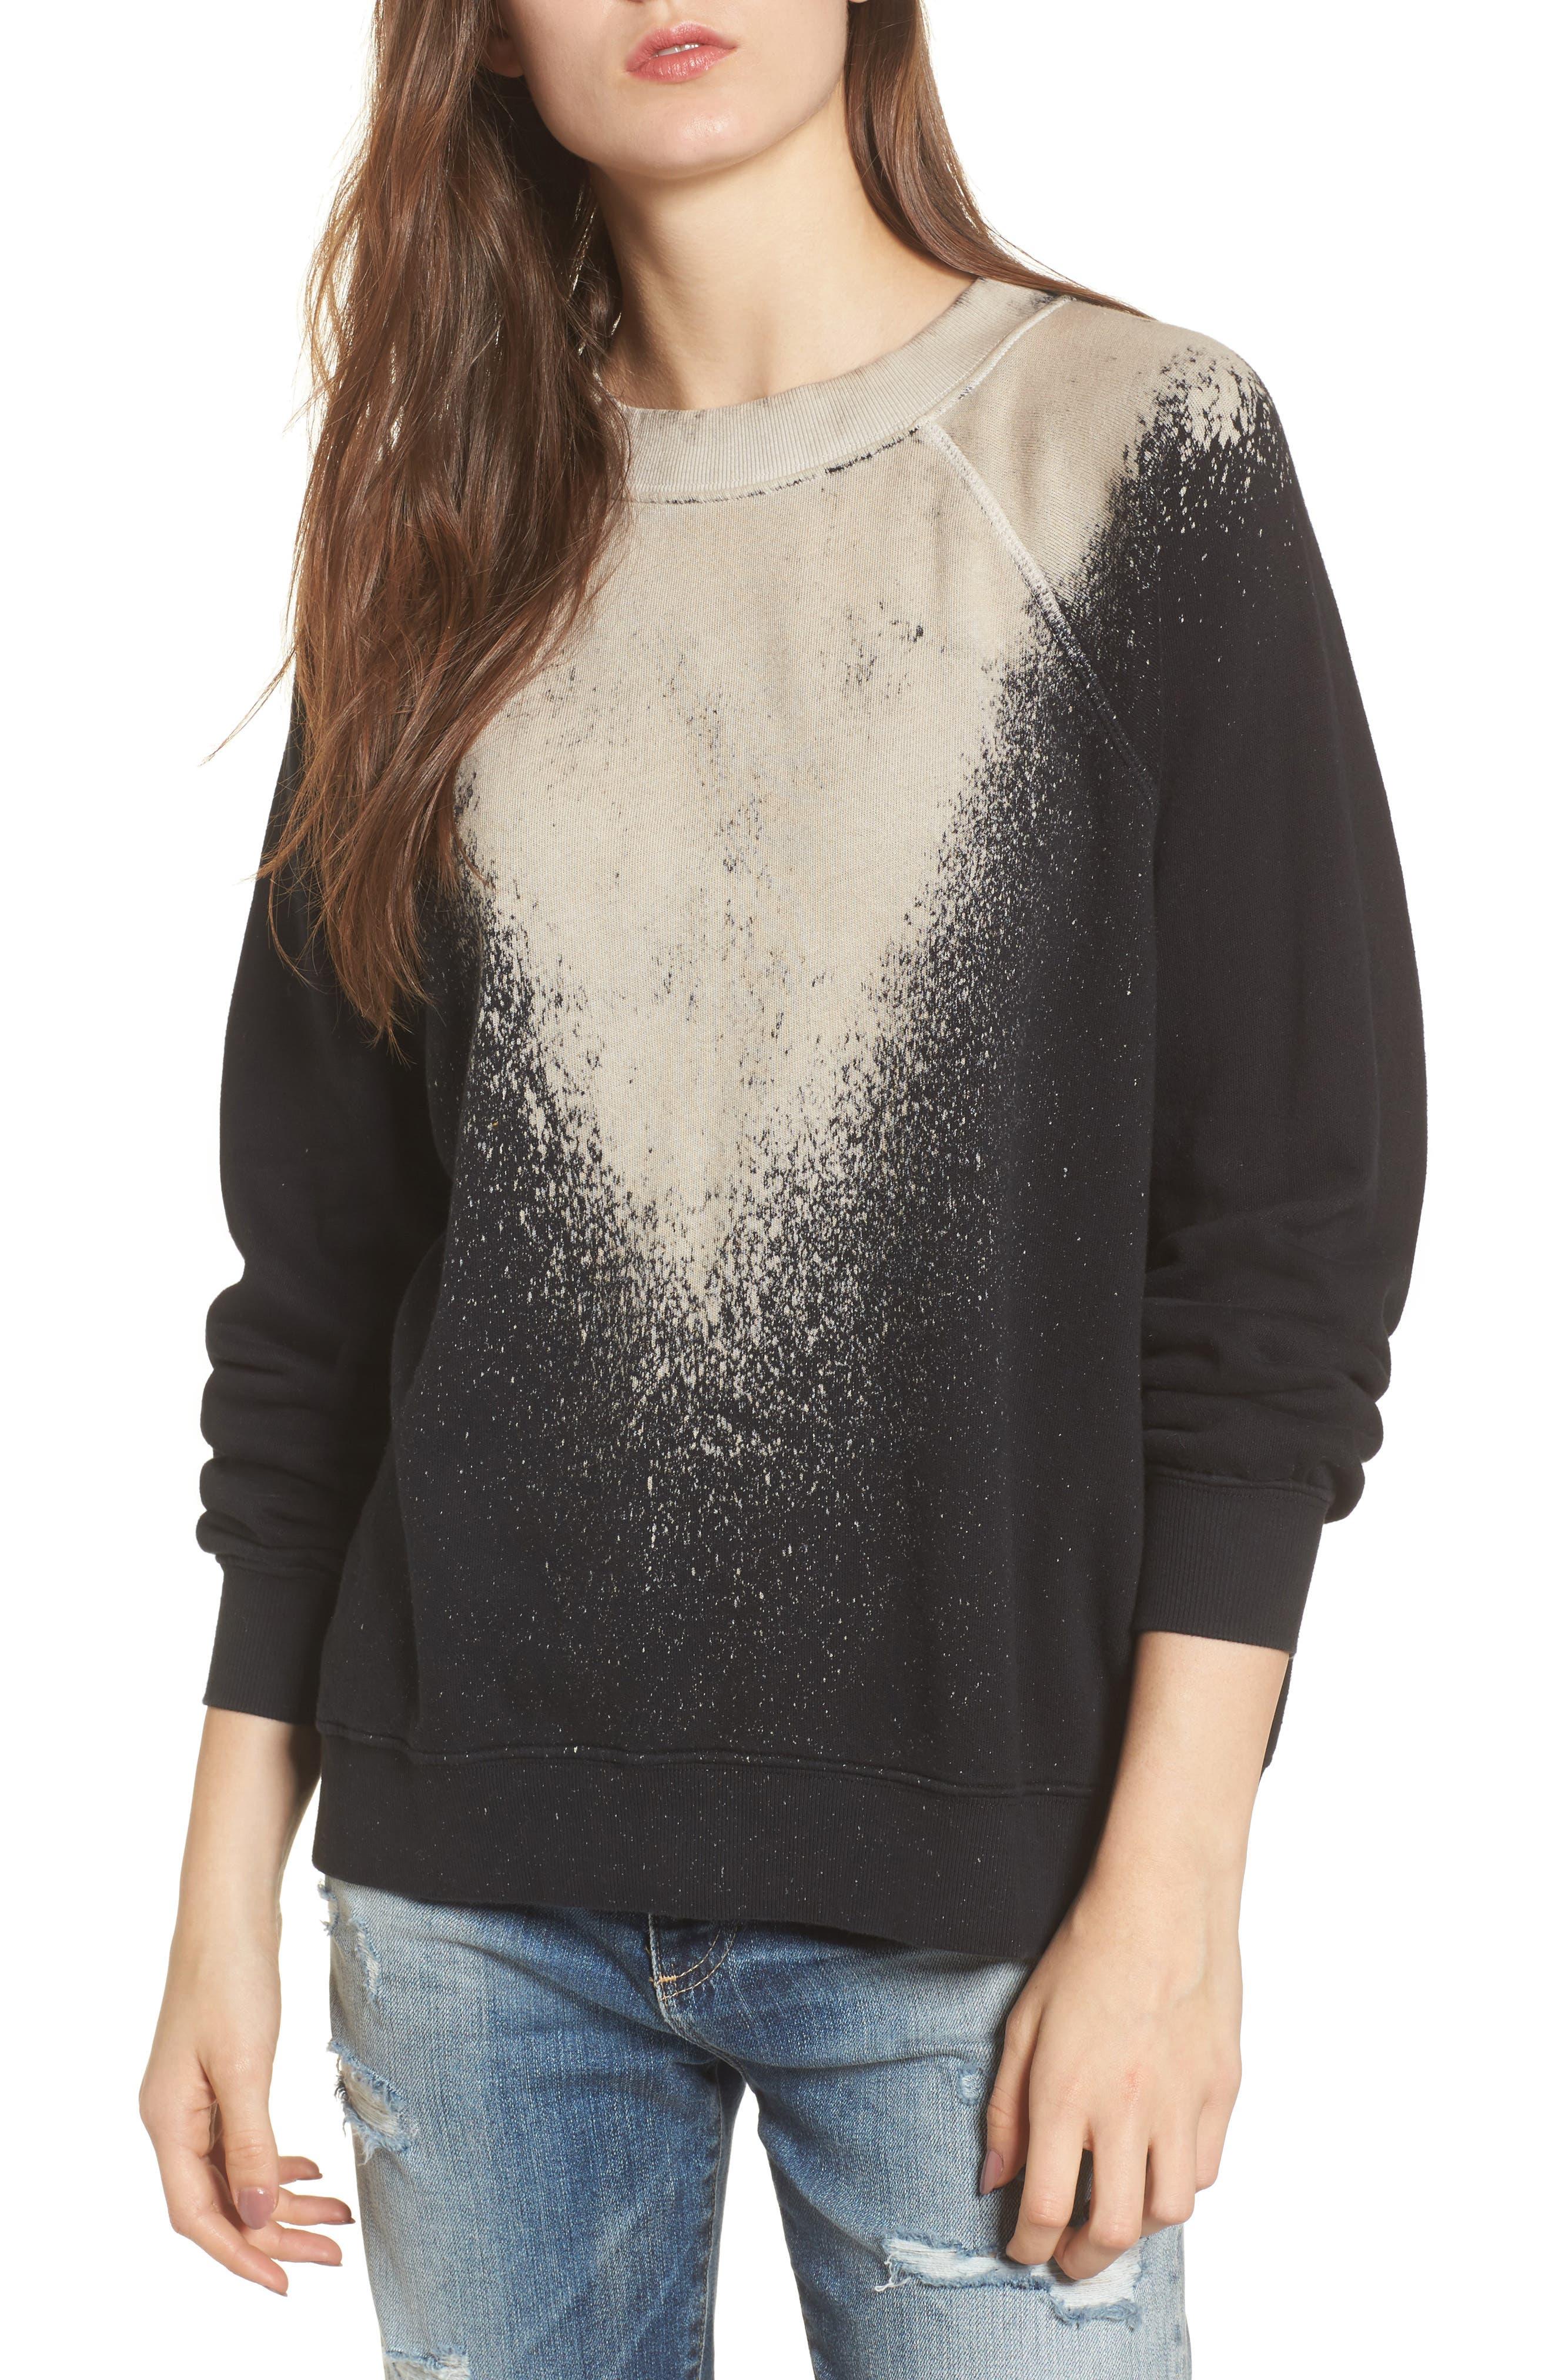 Stardust - Sommers Sweatshirt,                             Main thumbnail 1, color,                             003